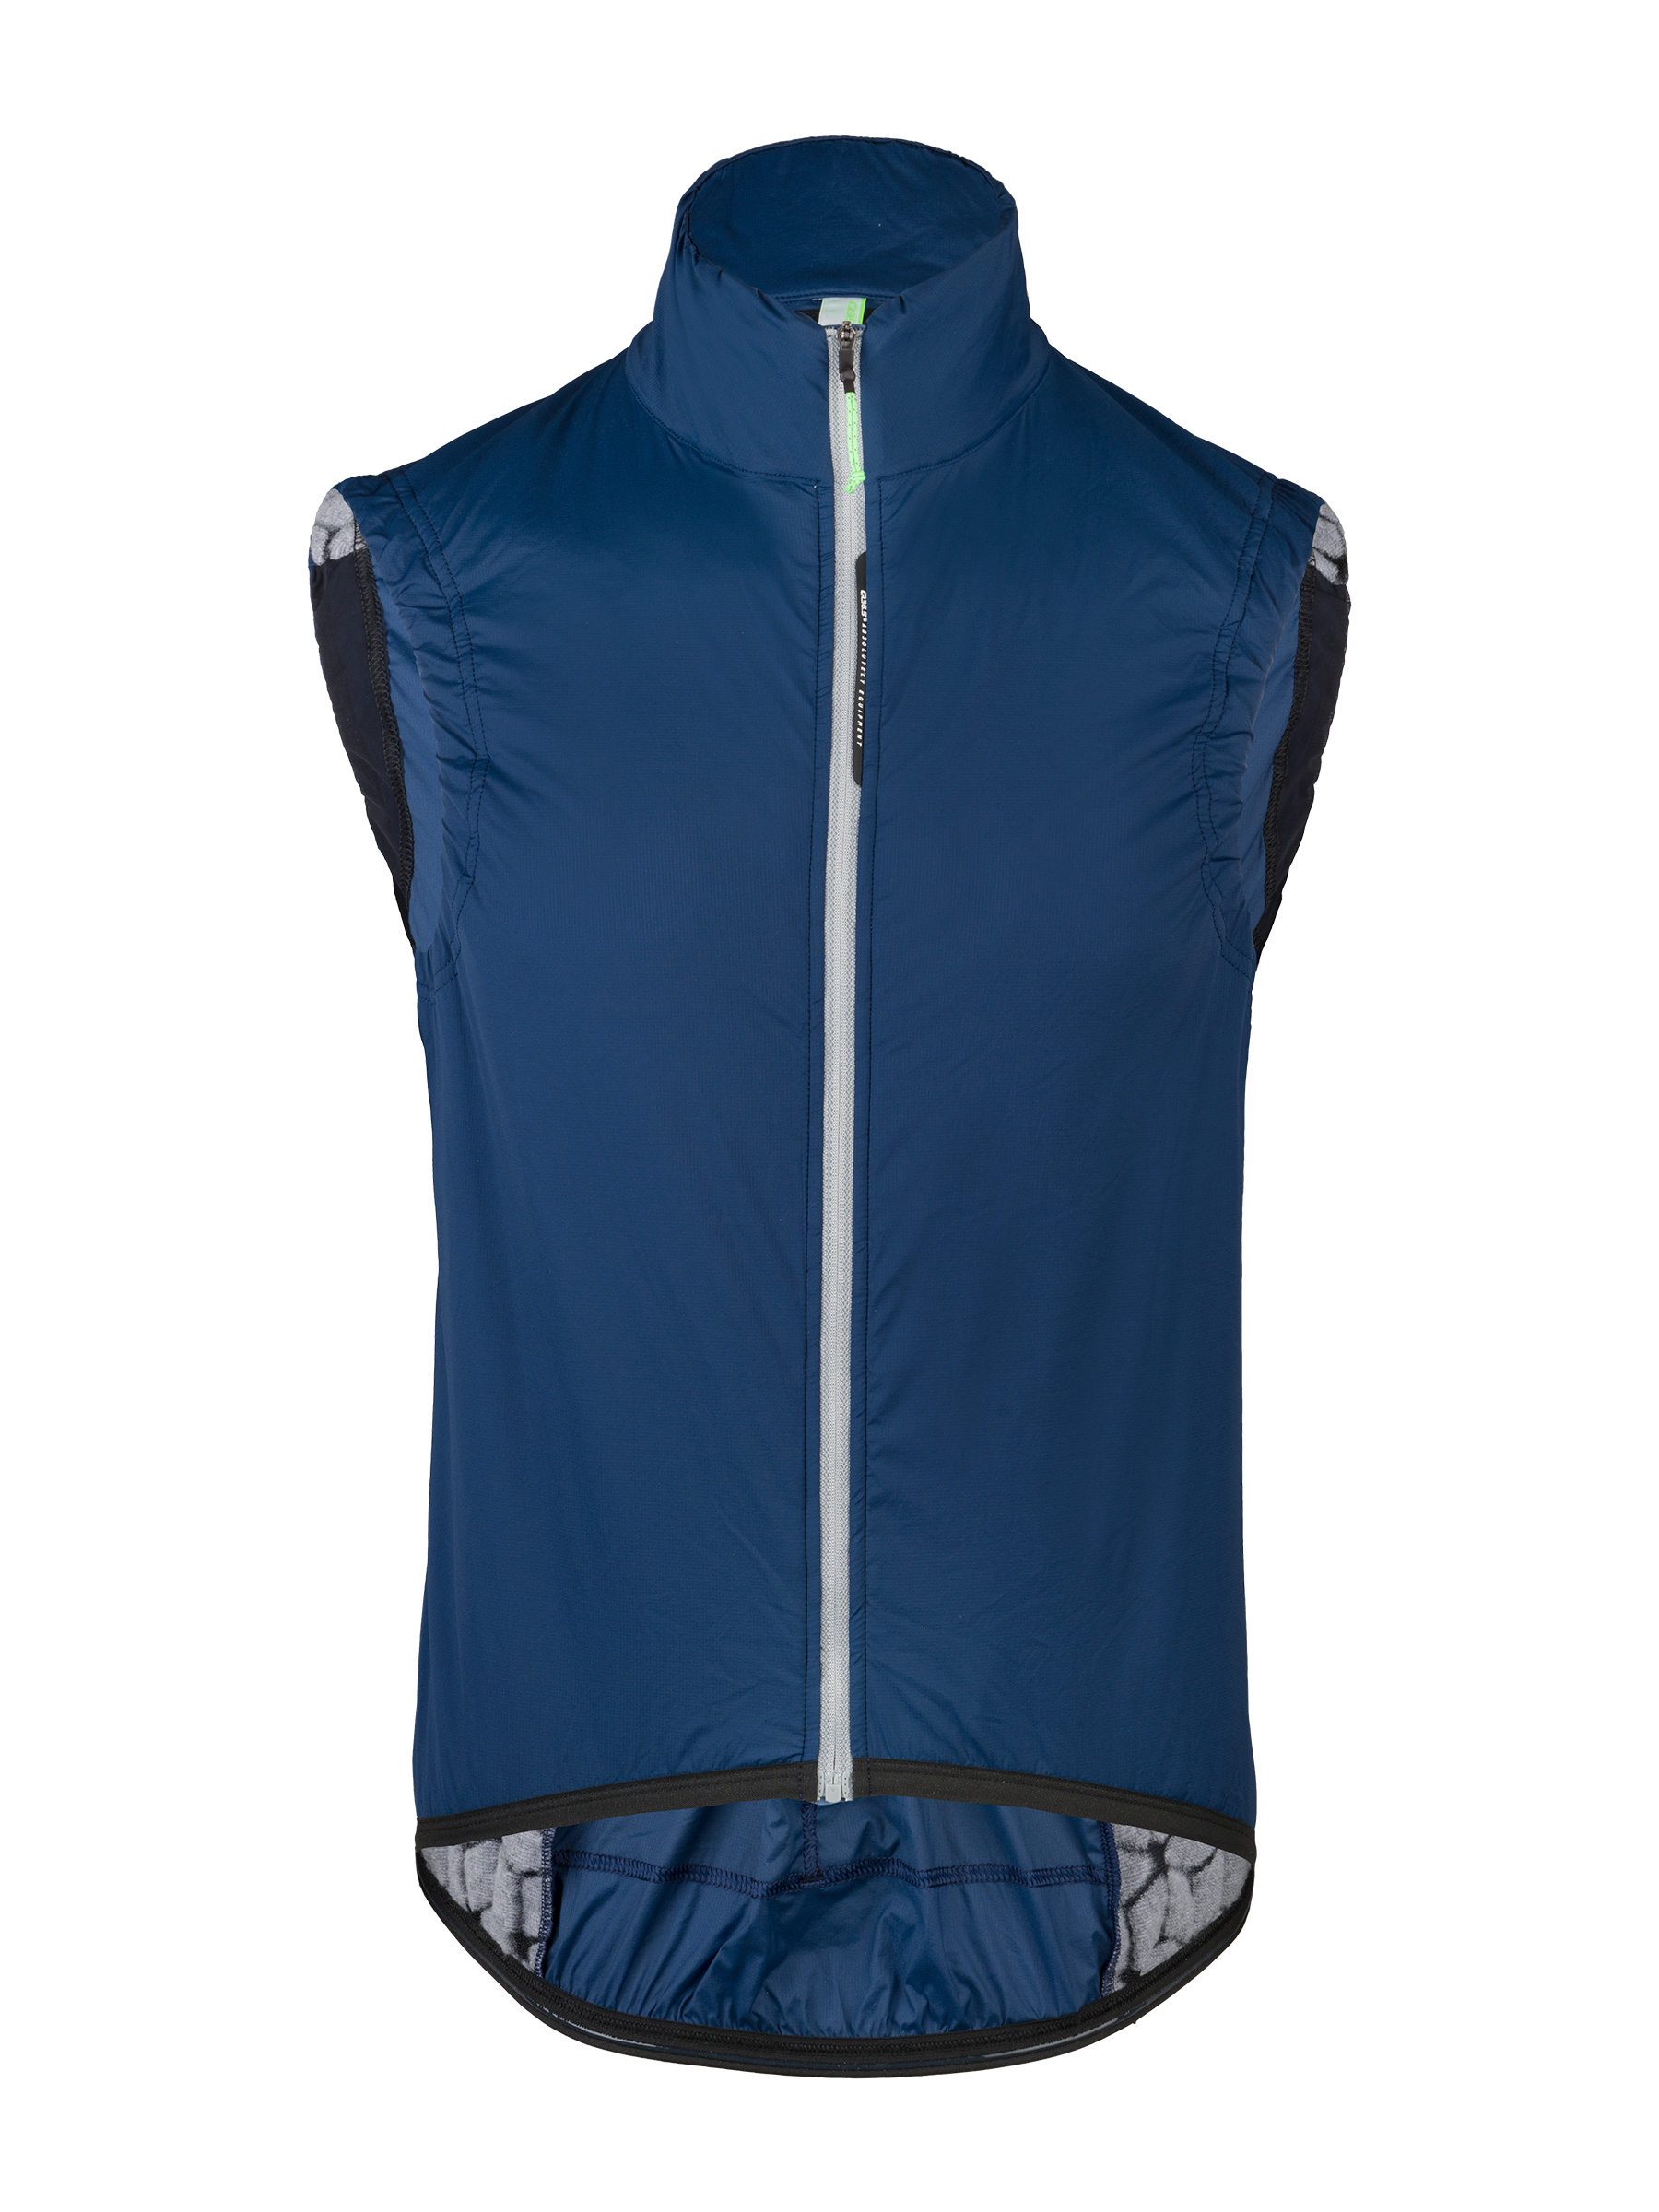 mens cycling vest adventure navy blue 061.9